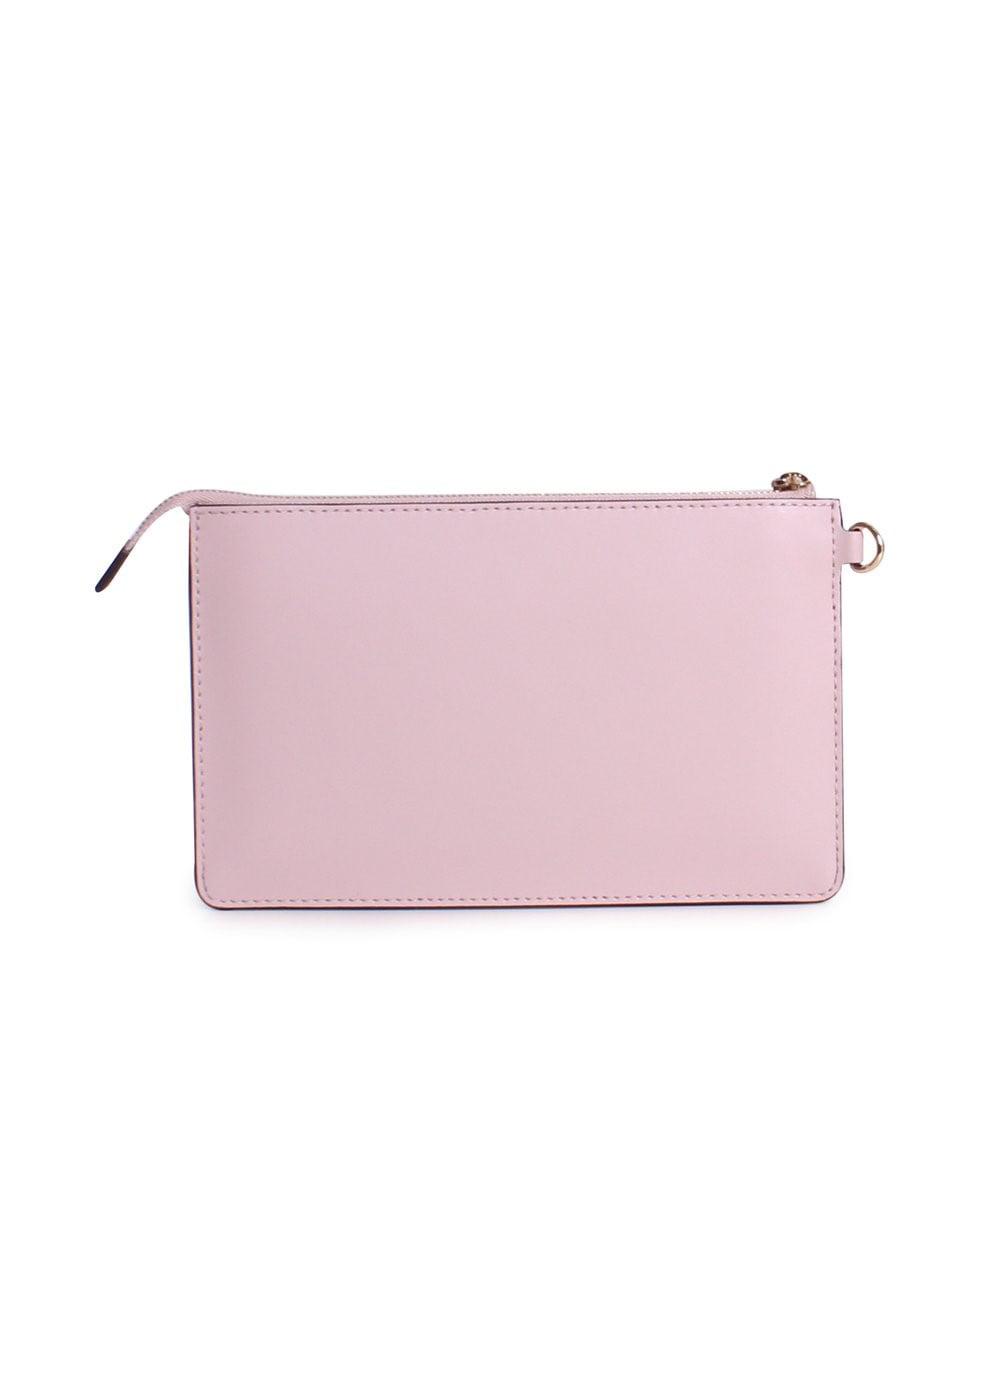 Michael Kors 32h7gfdw2o 187 Gusset Soft Pink Leather Love Wristlet Clutch Bag